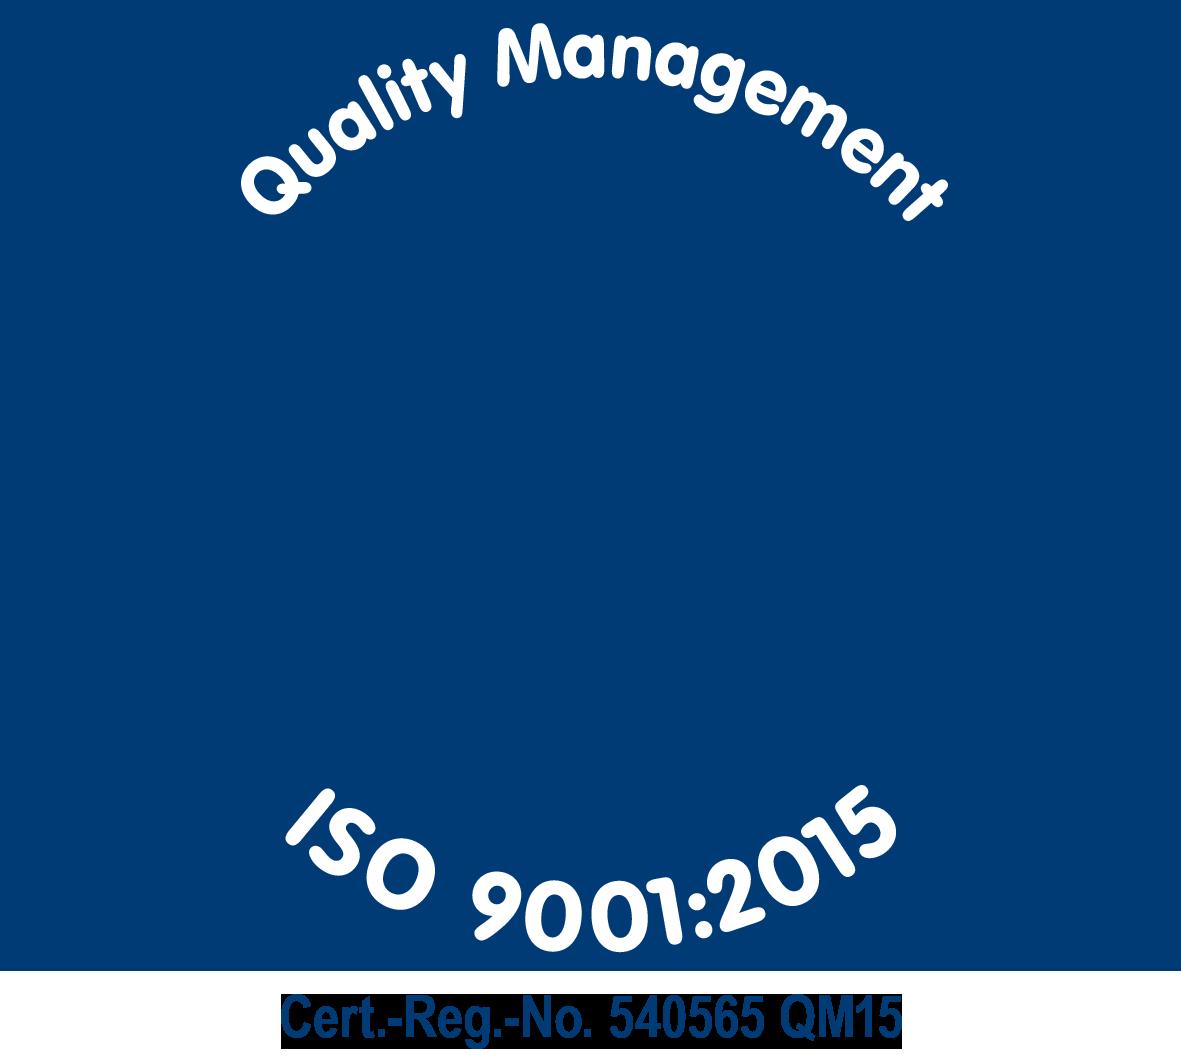 Zertifizierung DIN ISO9001:2015 - bluechemGROUP